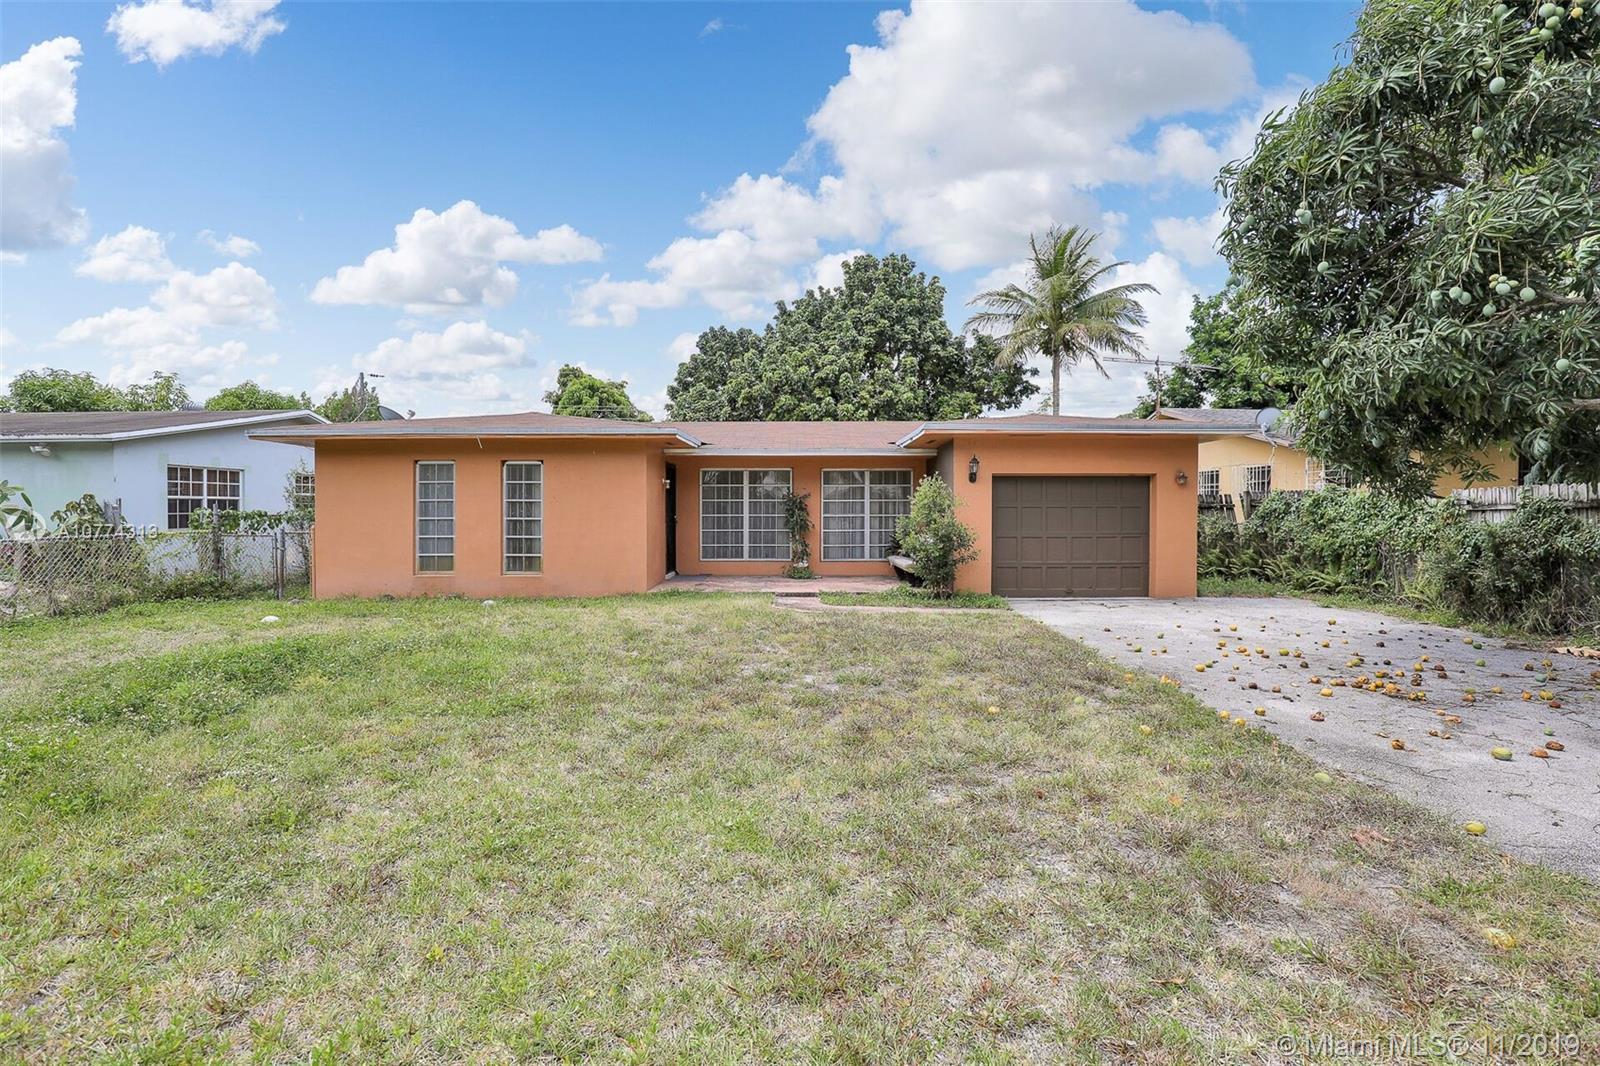 530 NE 165 ST, Miami Shores, Florida